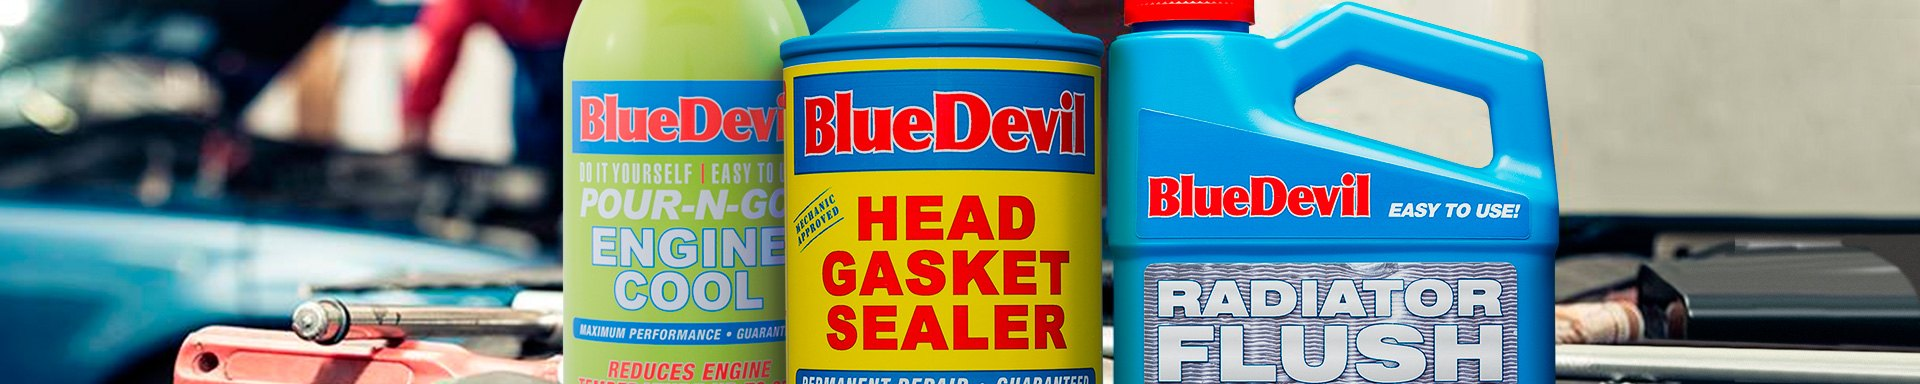 Bluedevil Head Gasket Transmission Radiator Sealers Caridcom